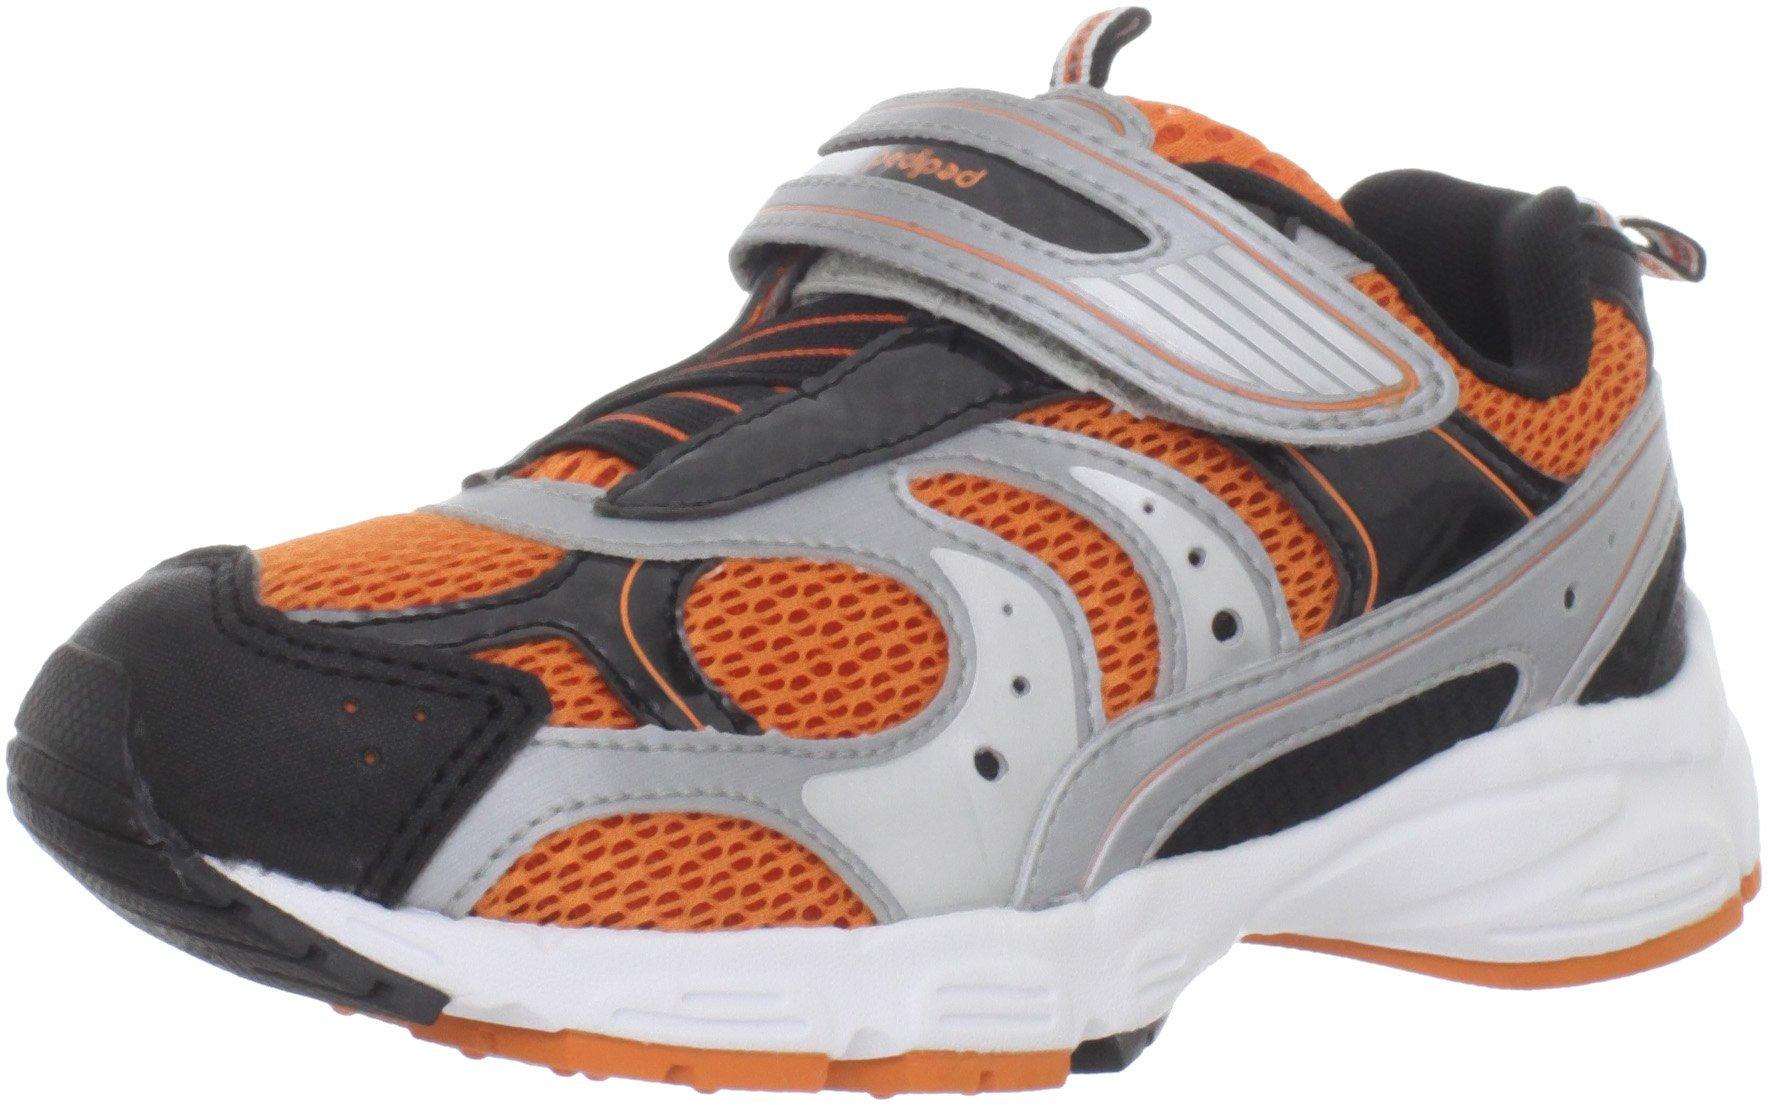 pediped Flex Saturn Running Shoe (Toddler/Little Kid),Black/Silver/Orange,24 EU (7.5-8 M US Toddler)